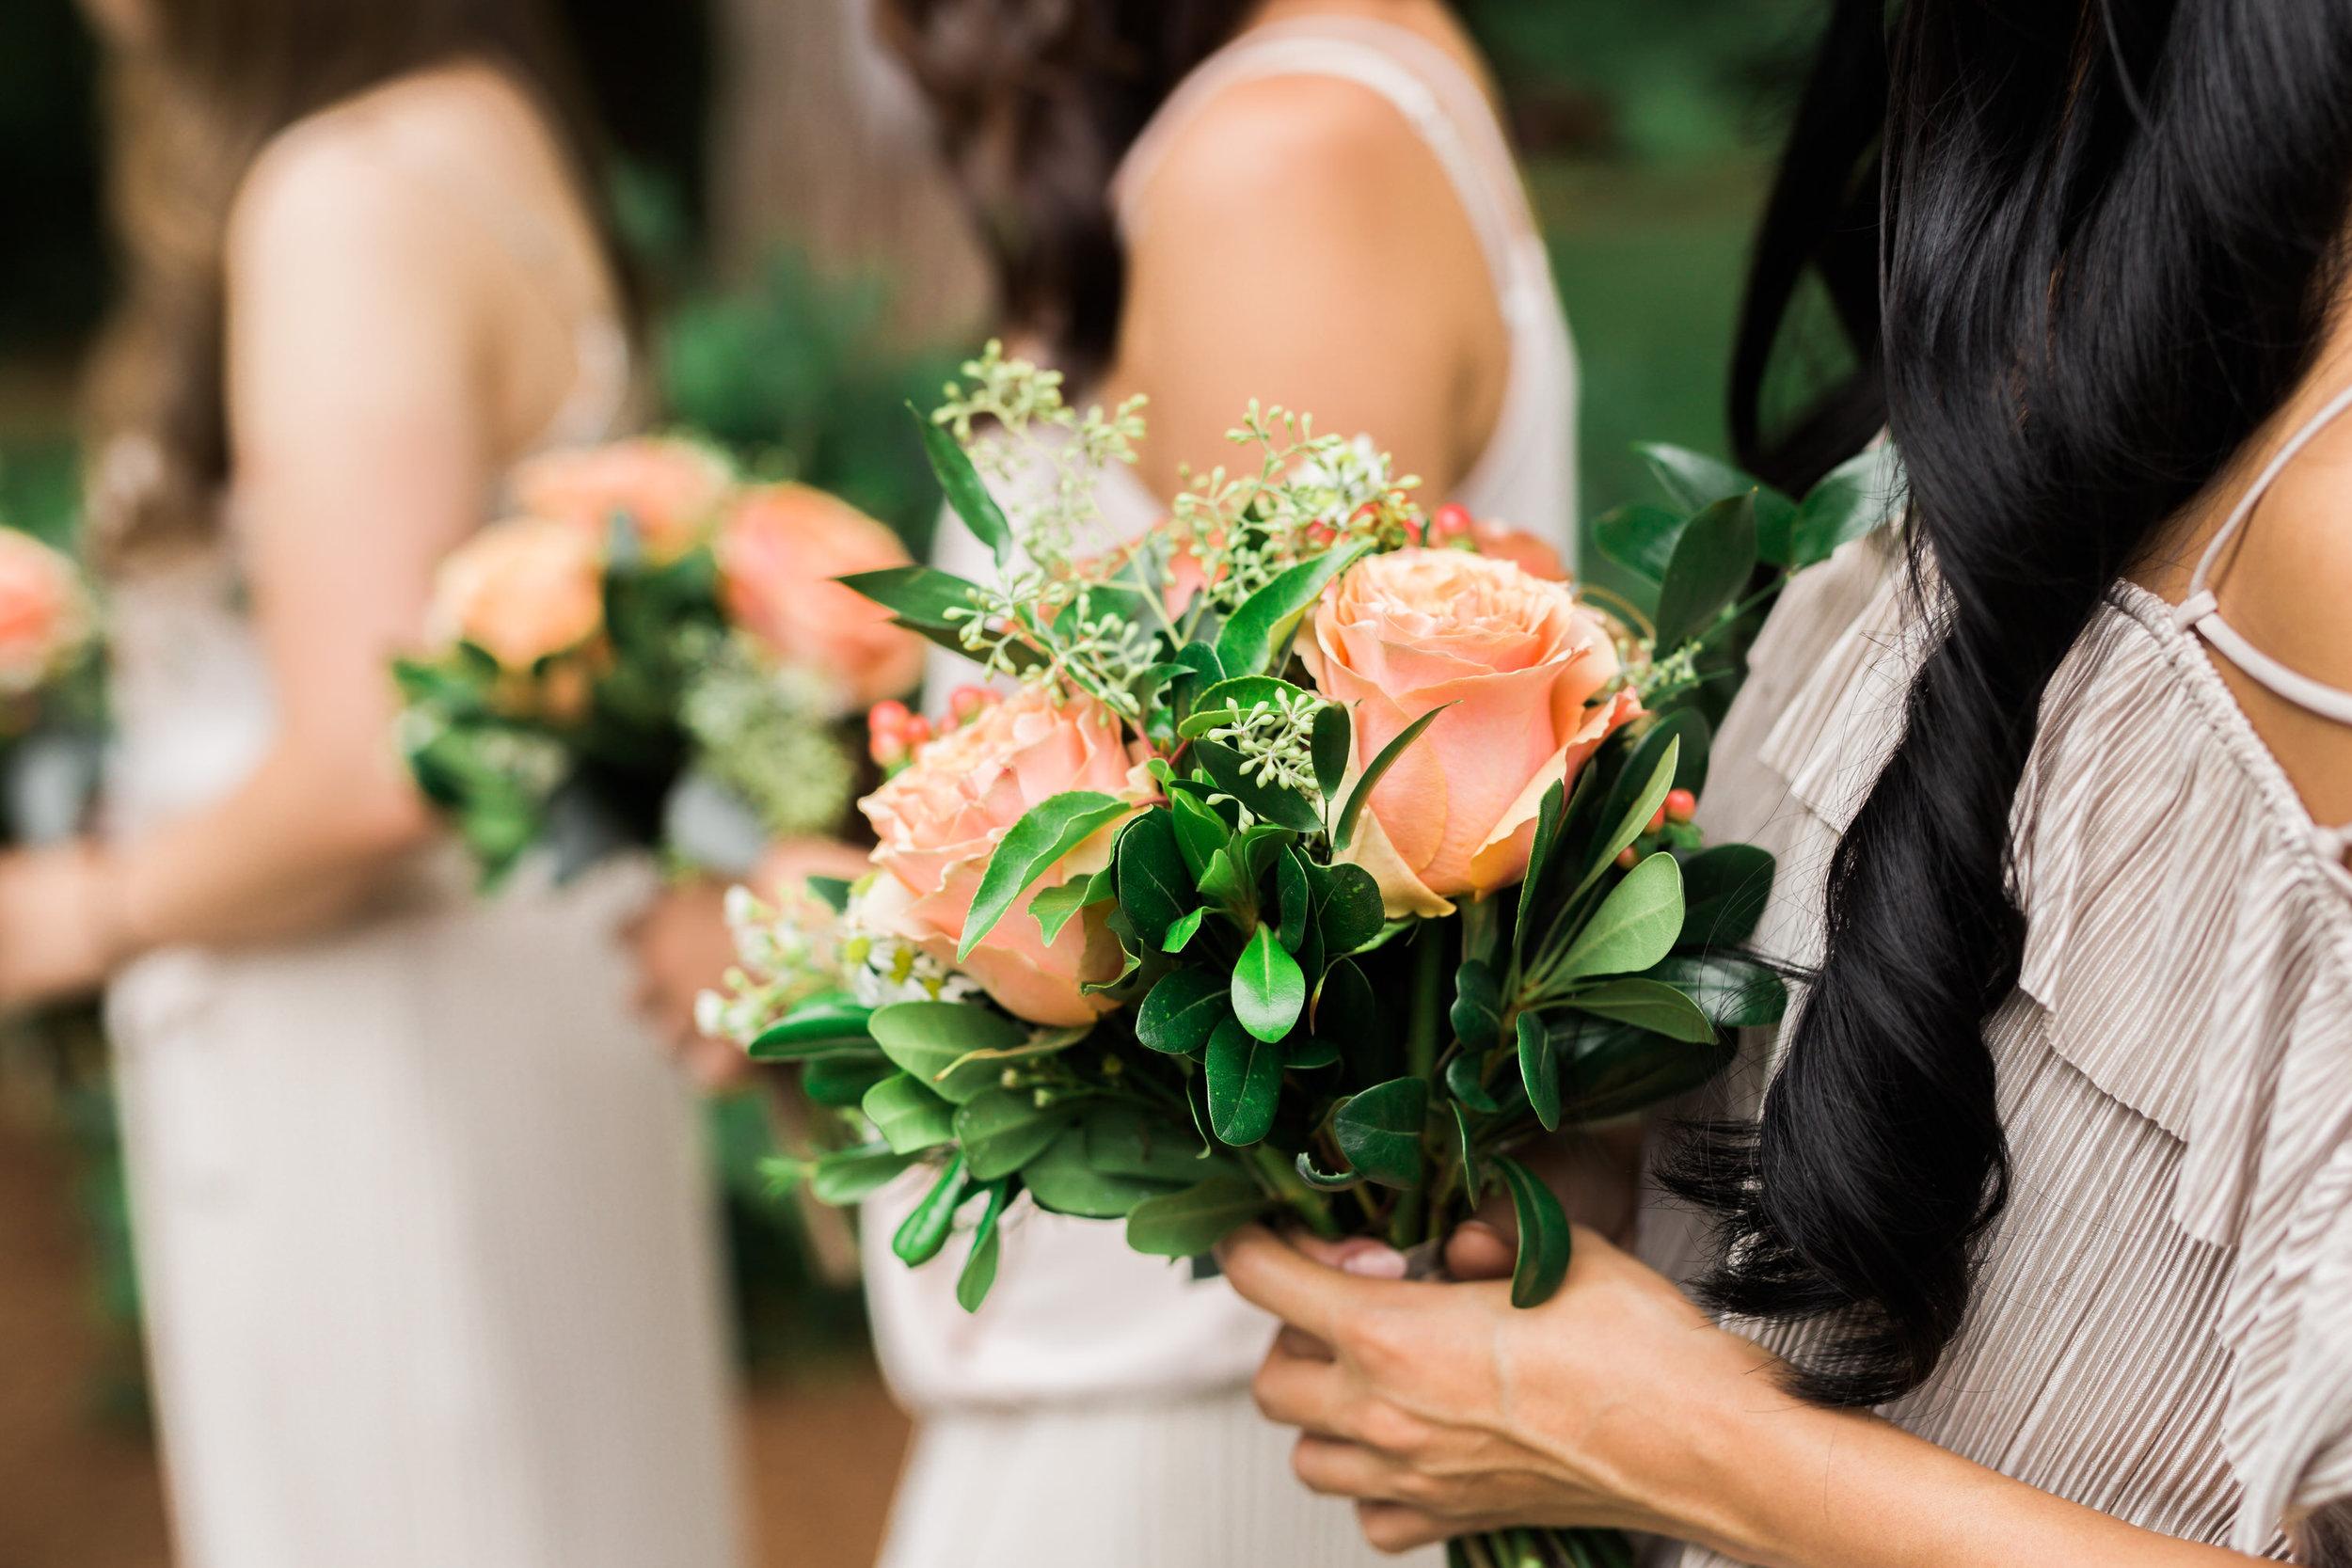 Linwood House Wedding Photos - Roberts Creek Wedding Photos - Vancouver Wedding Photographer & Videographer - Sunshine Coast Wedding Photos - Sunshine Coast Wedding Photographer - Jennifer Picard Photography - IMG_6374.jpg